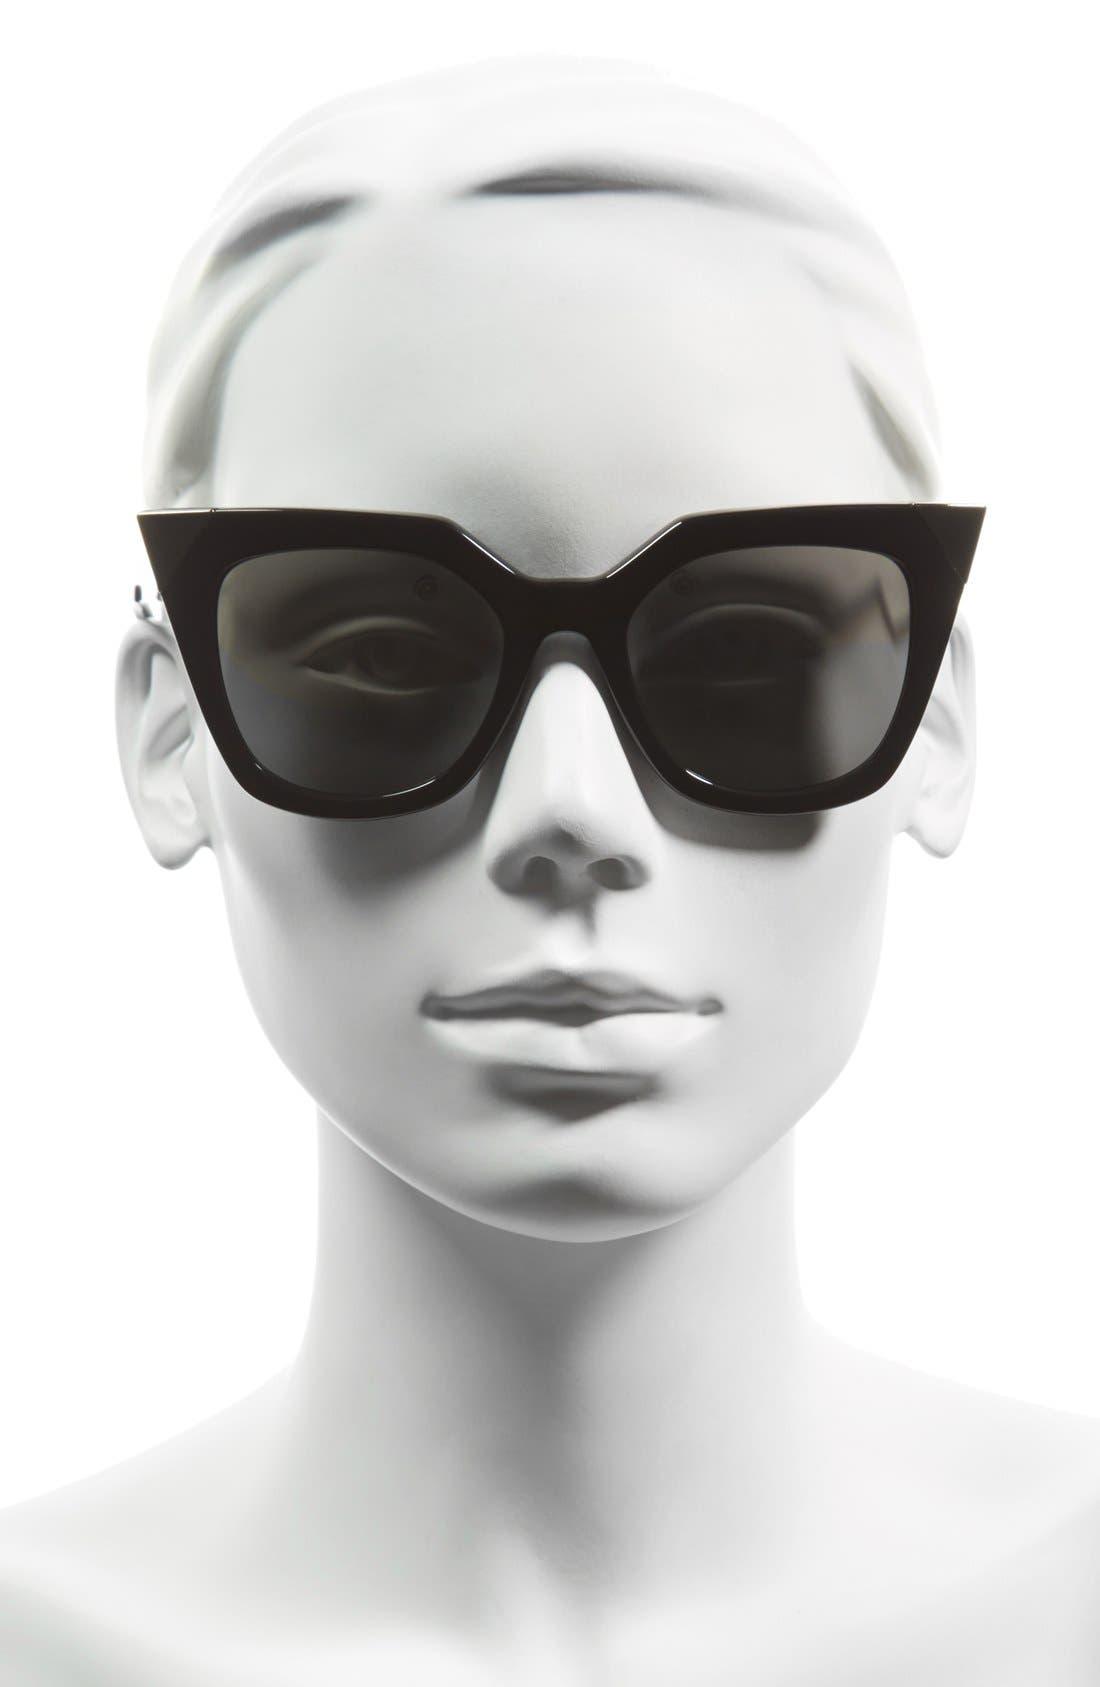 52mm Cat Eye Sunglasses,                             Alternate thumbnail 9, color,